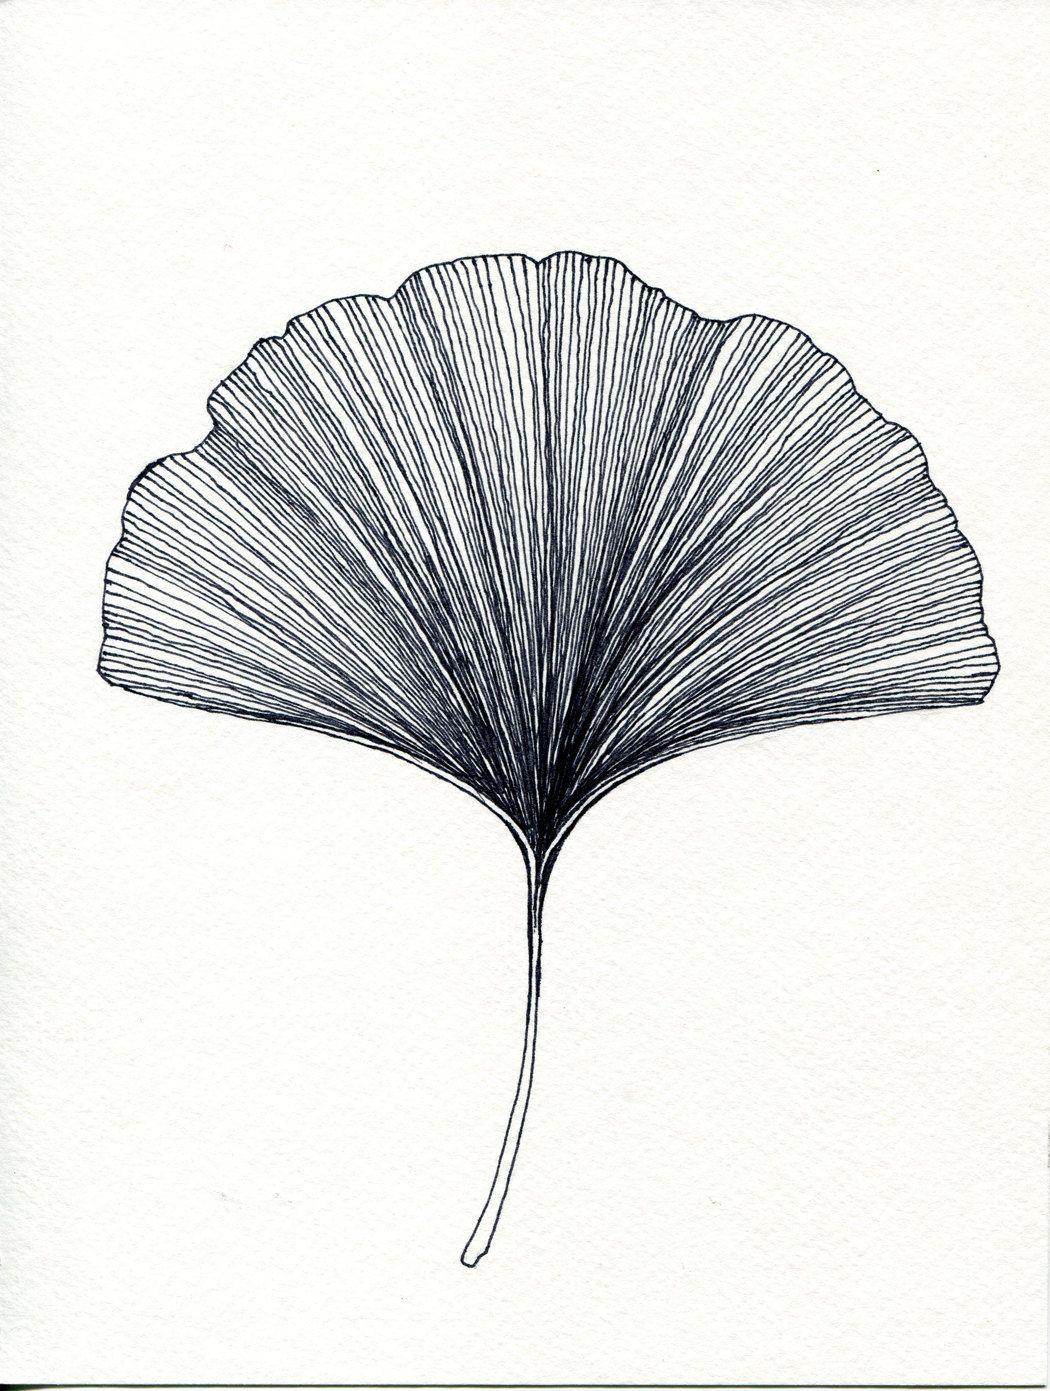 Ginkgo leaf print of original black or green pen and ink drawing